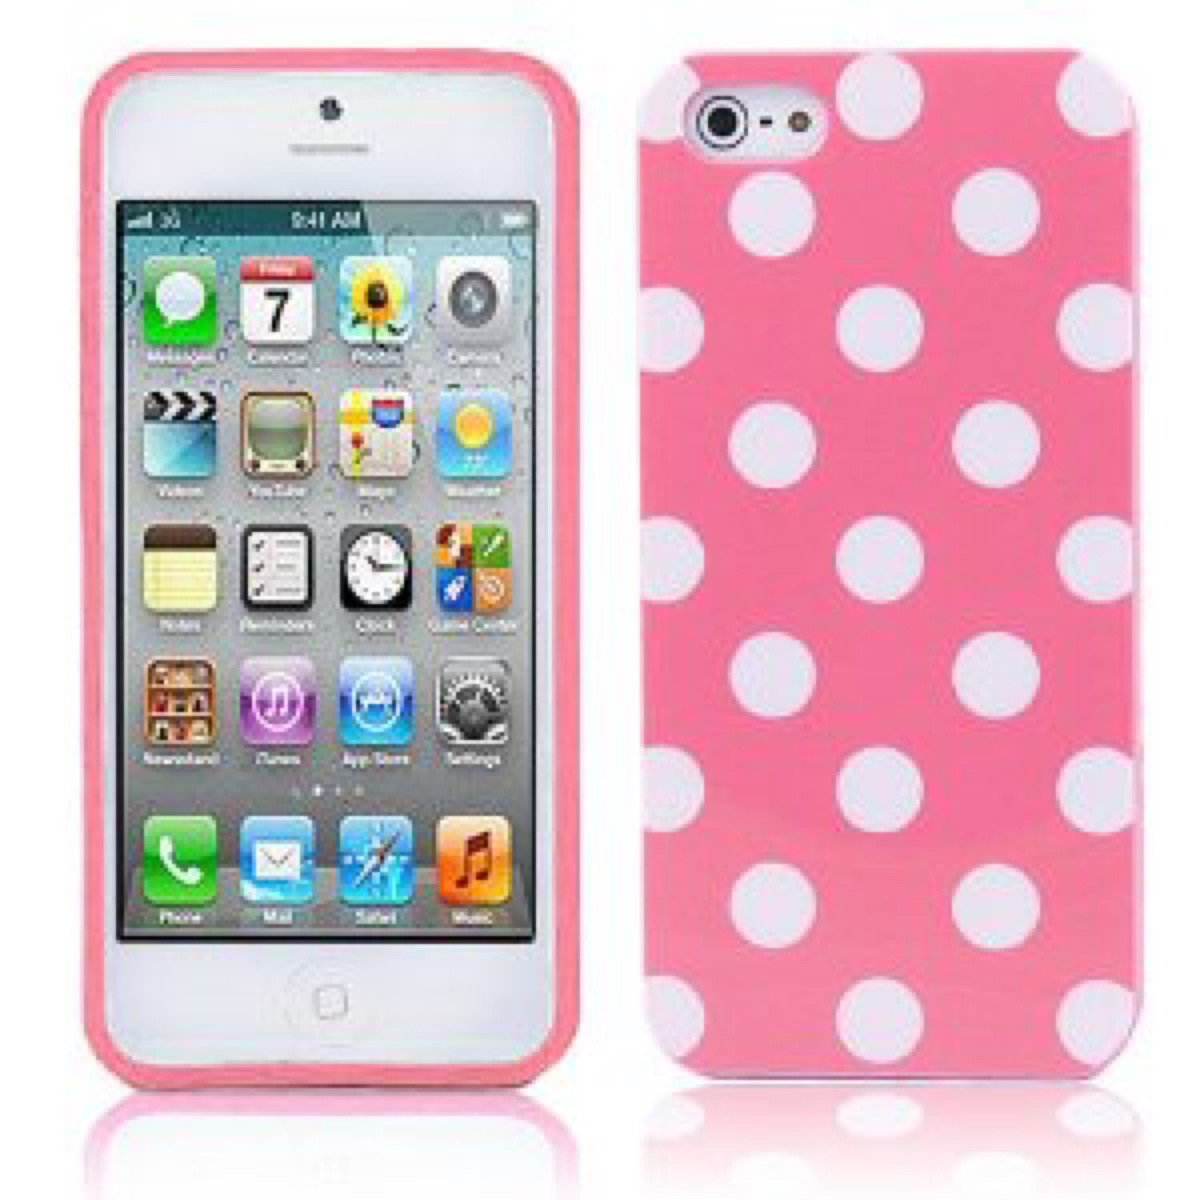 1a22af72703 iPhone 6 Protector Carcasa Lunares Mujer Tpu Silicona - $ 300,00 en ...